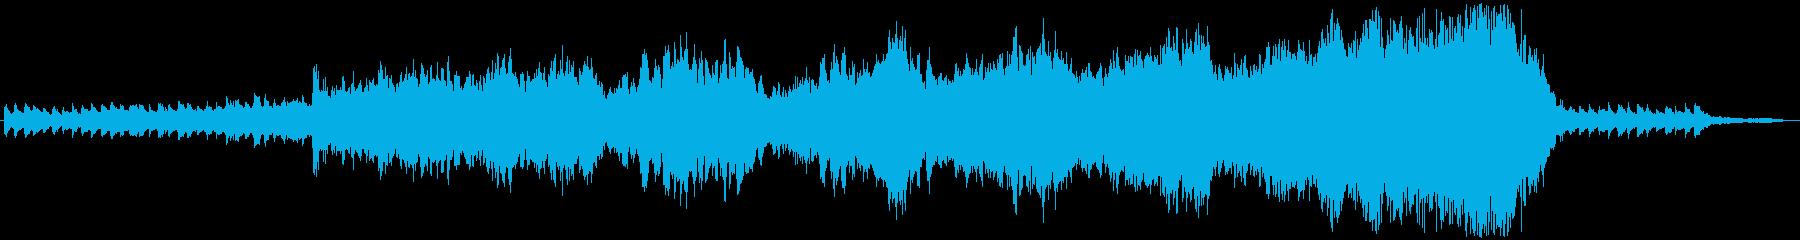 Cold Lake 60秒メロディー無しの再生済みの波形